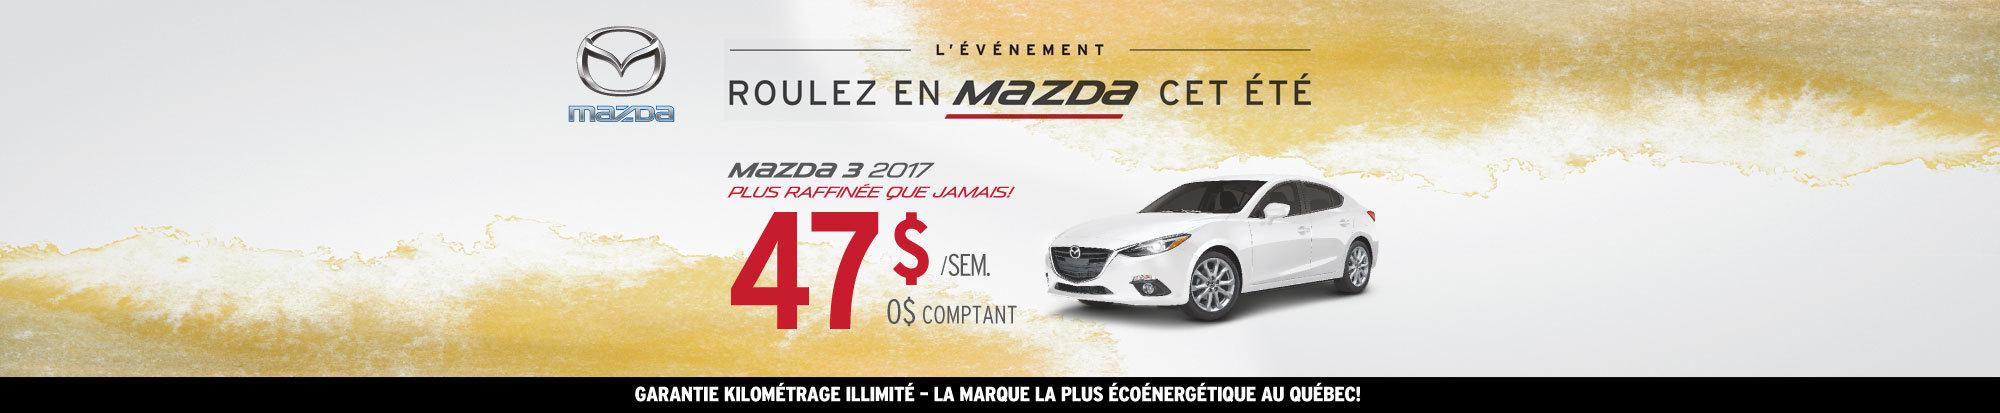 Louez la Mazda3 (web)